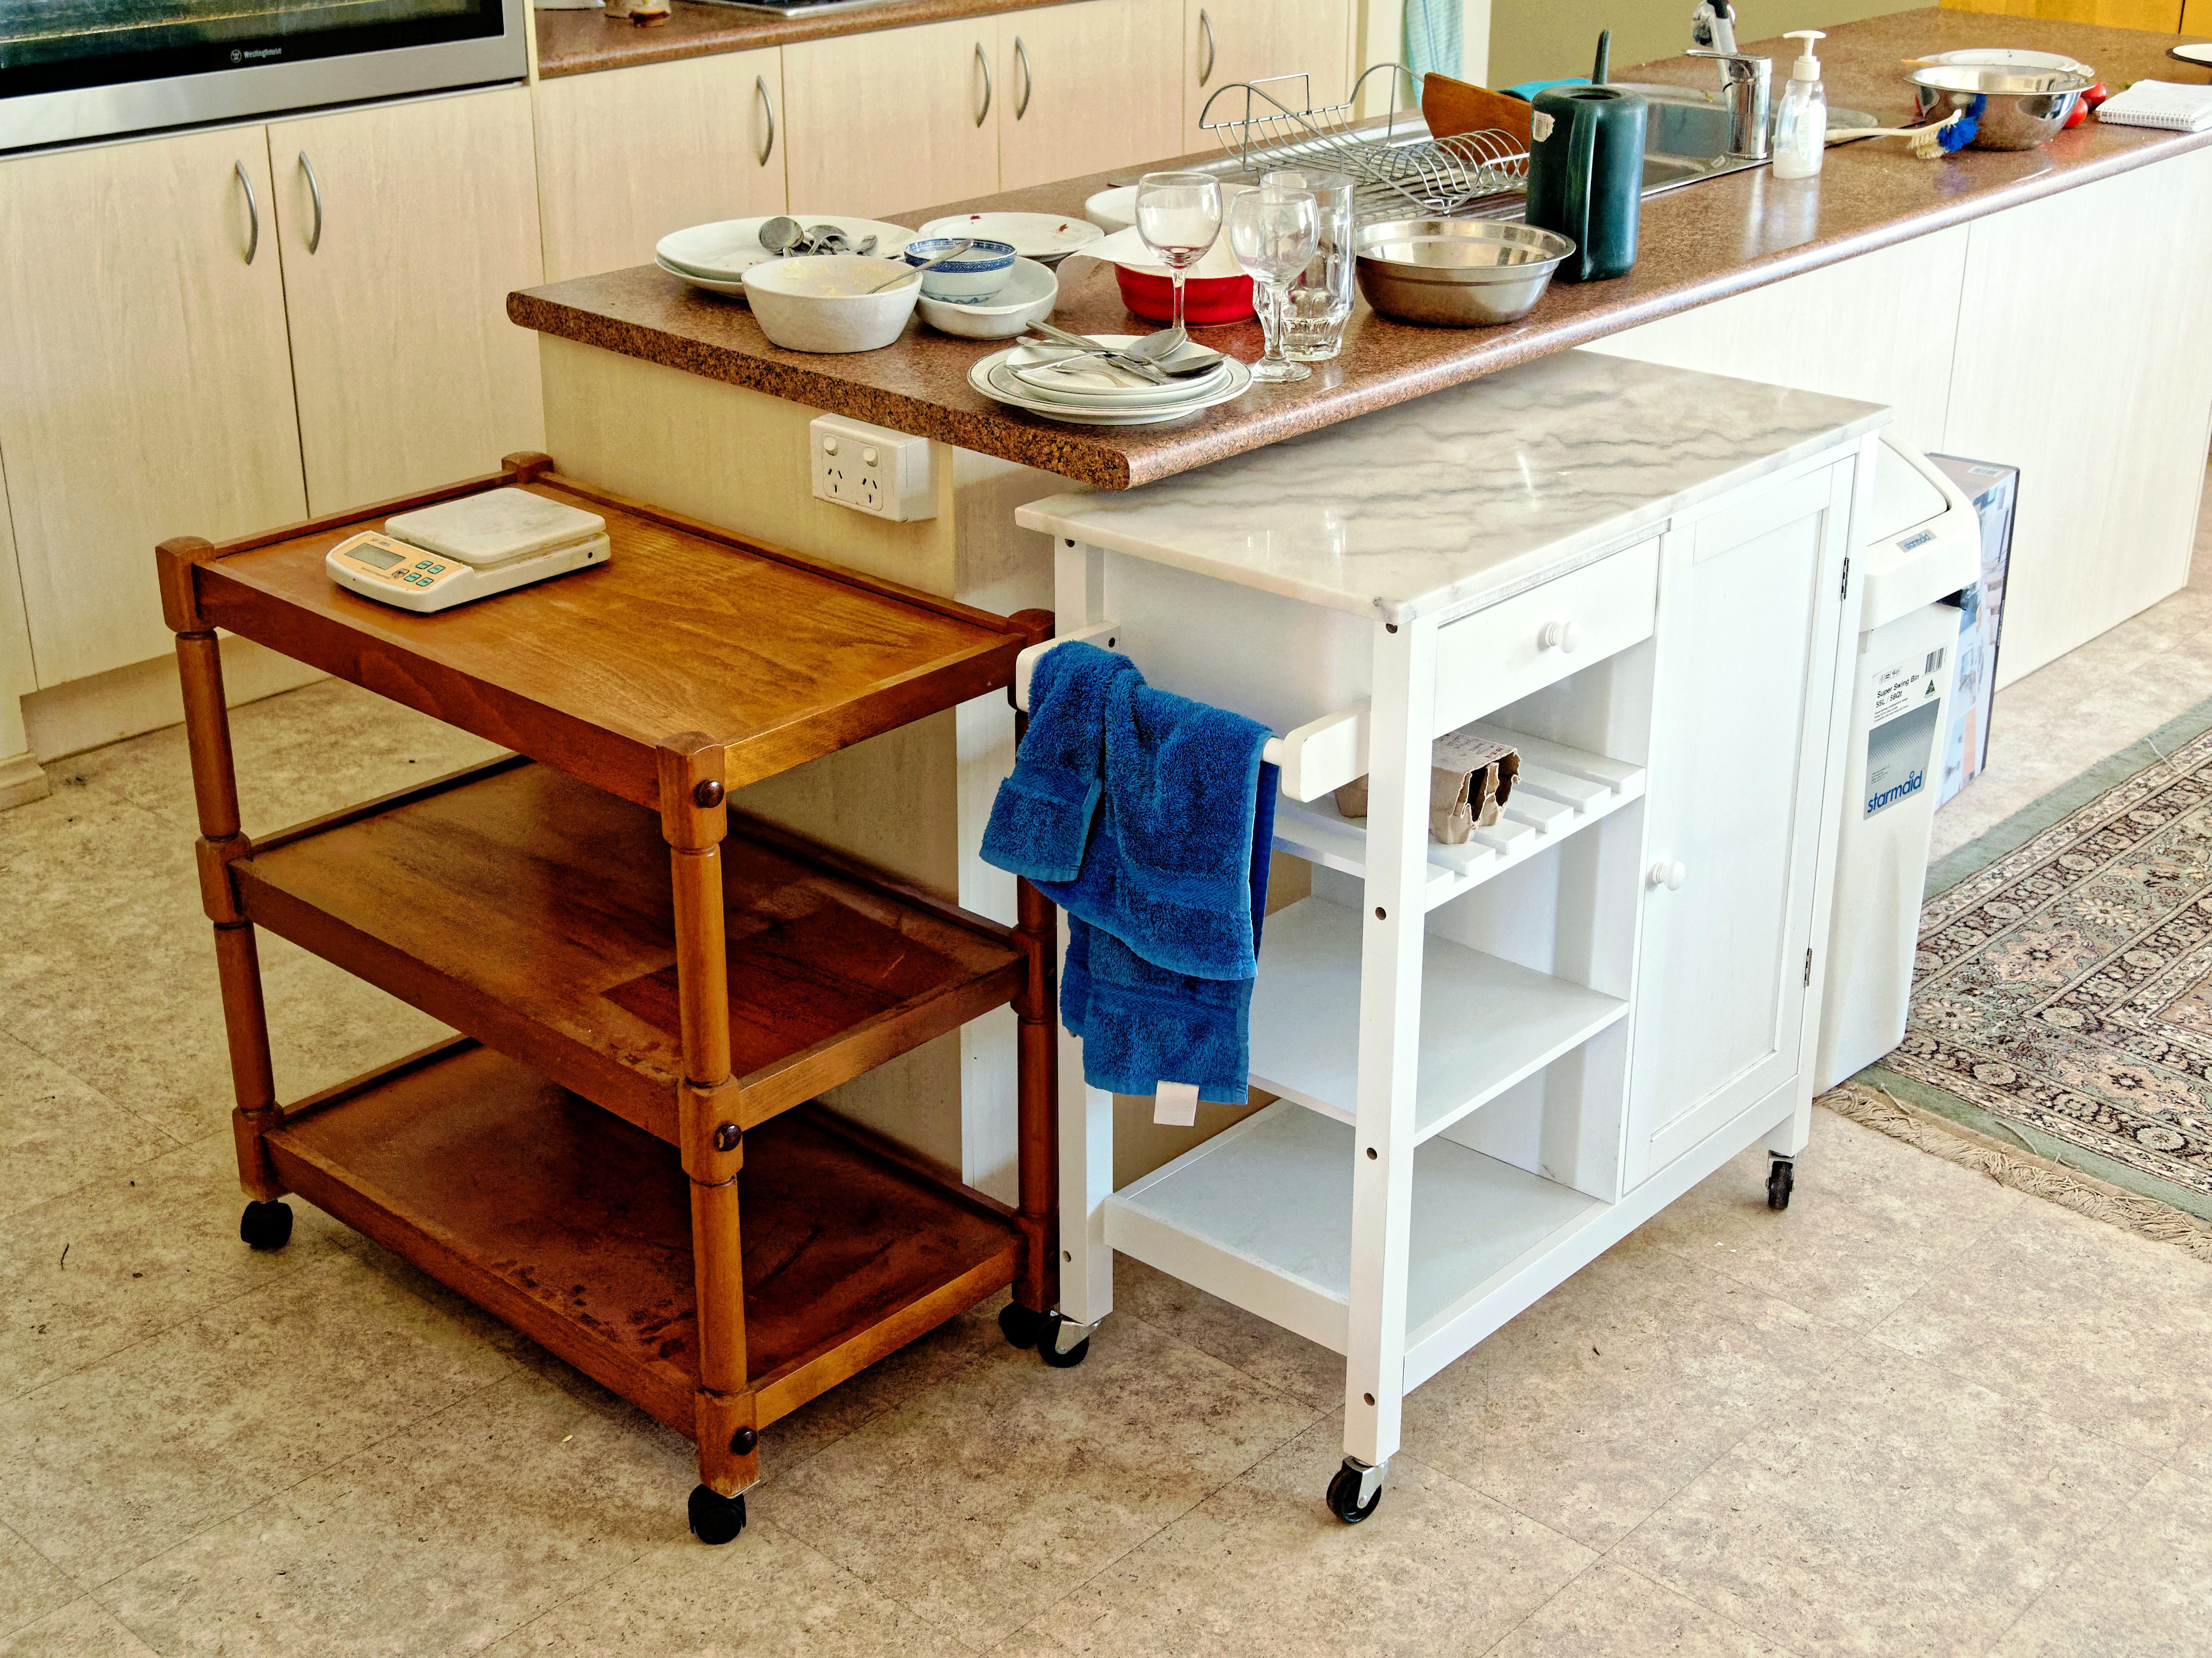 Kitchen-trolley-2.jpeg